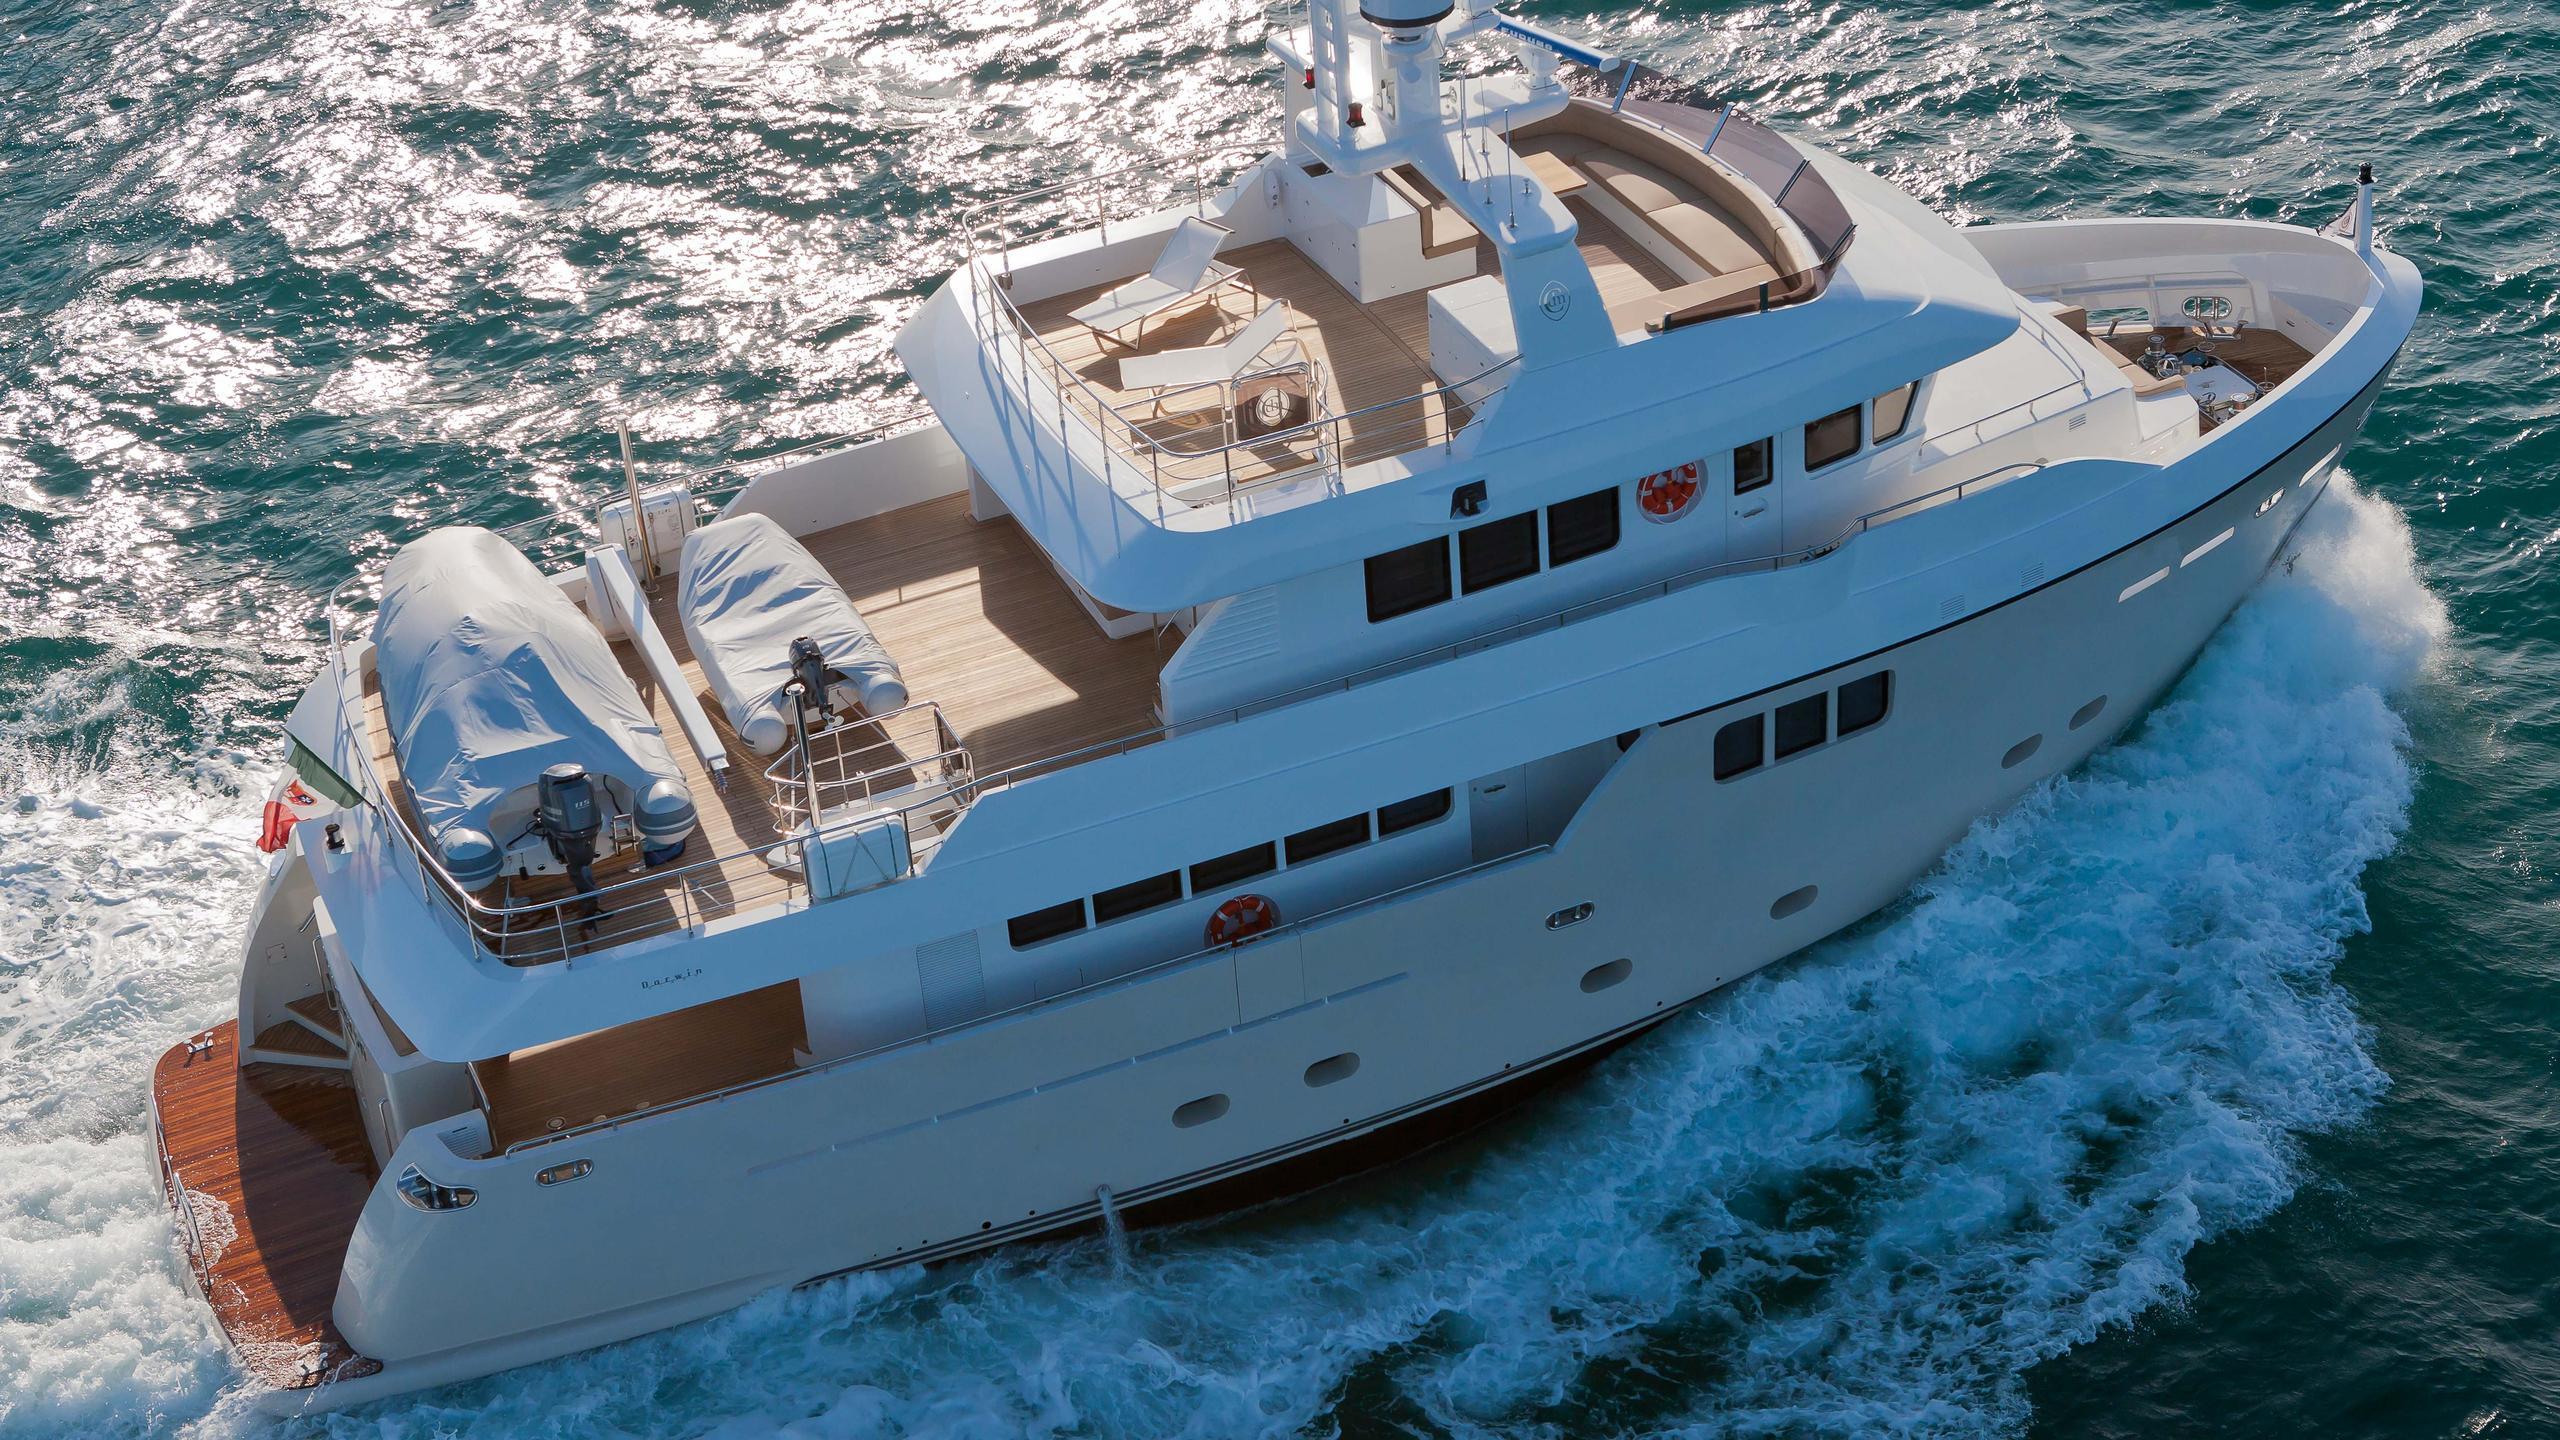 percheron-motor-yacht-cantiere-delle-marche-darwin-86-2012-26m-aerial